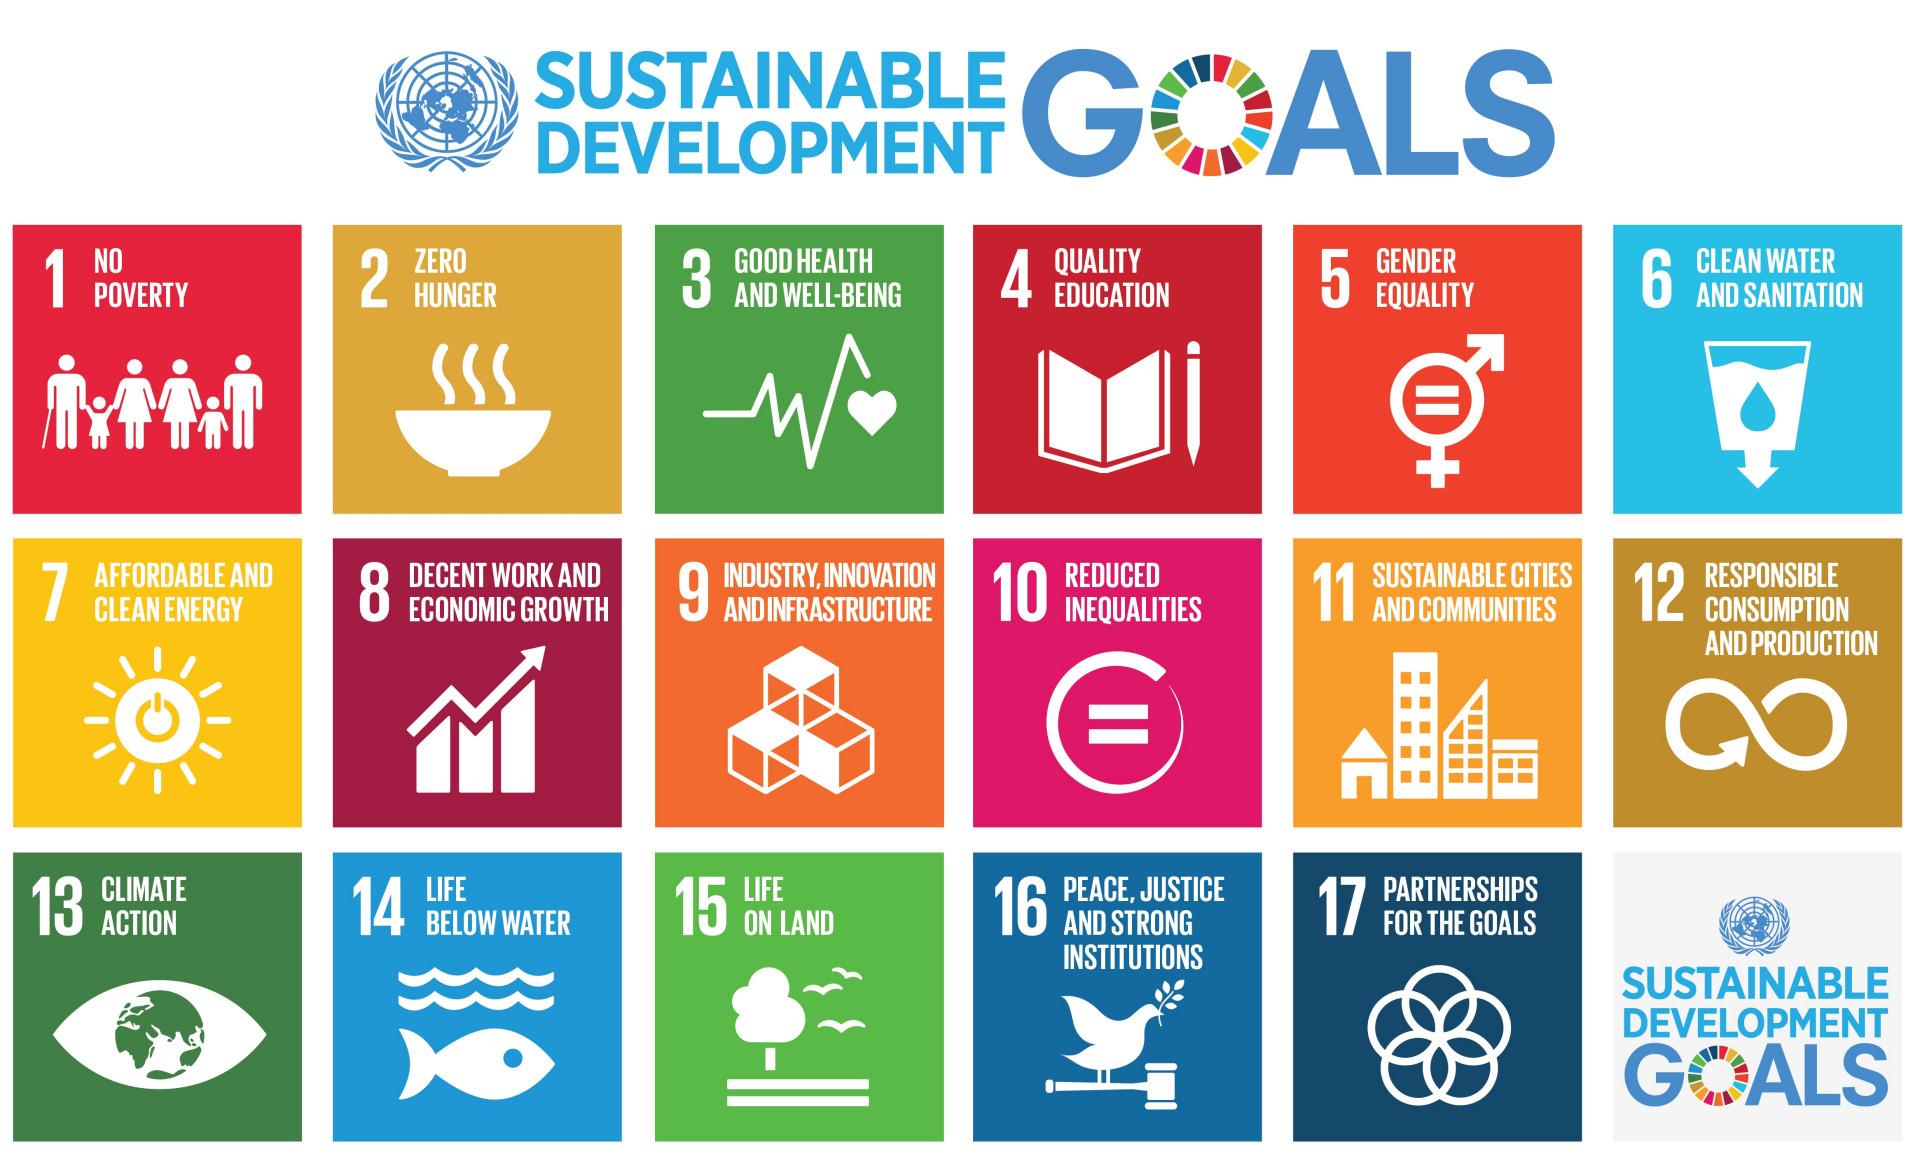 17 UN Sustainable Development Goals